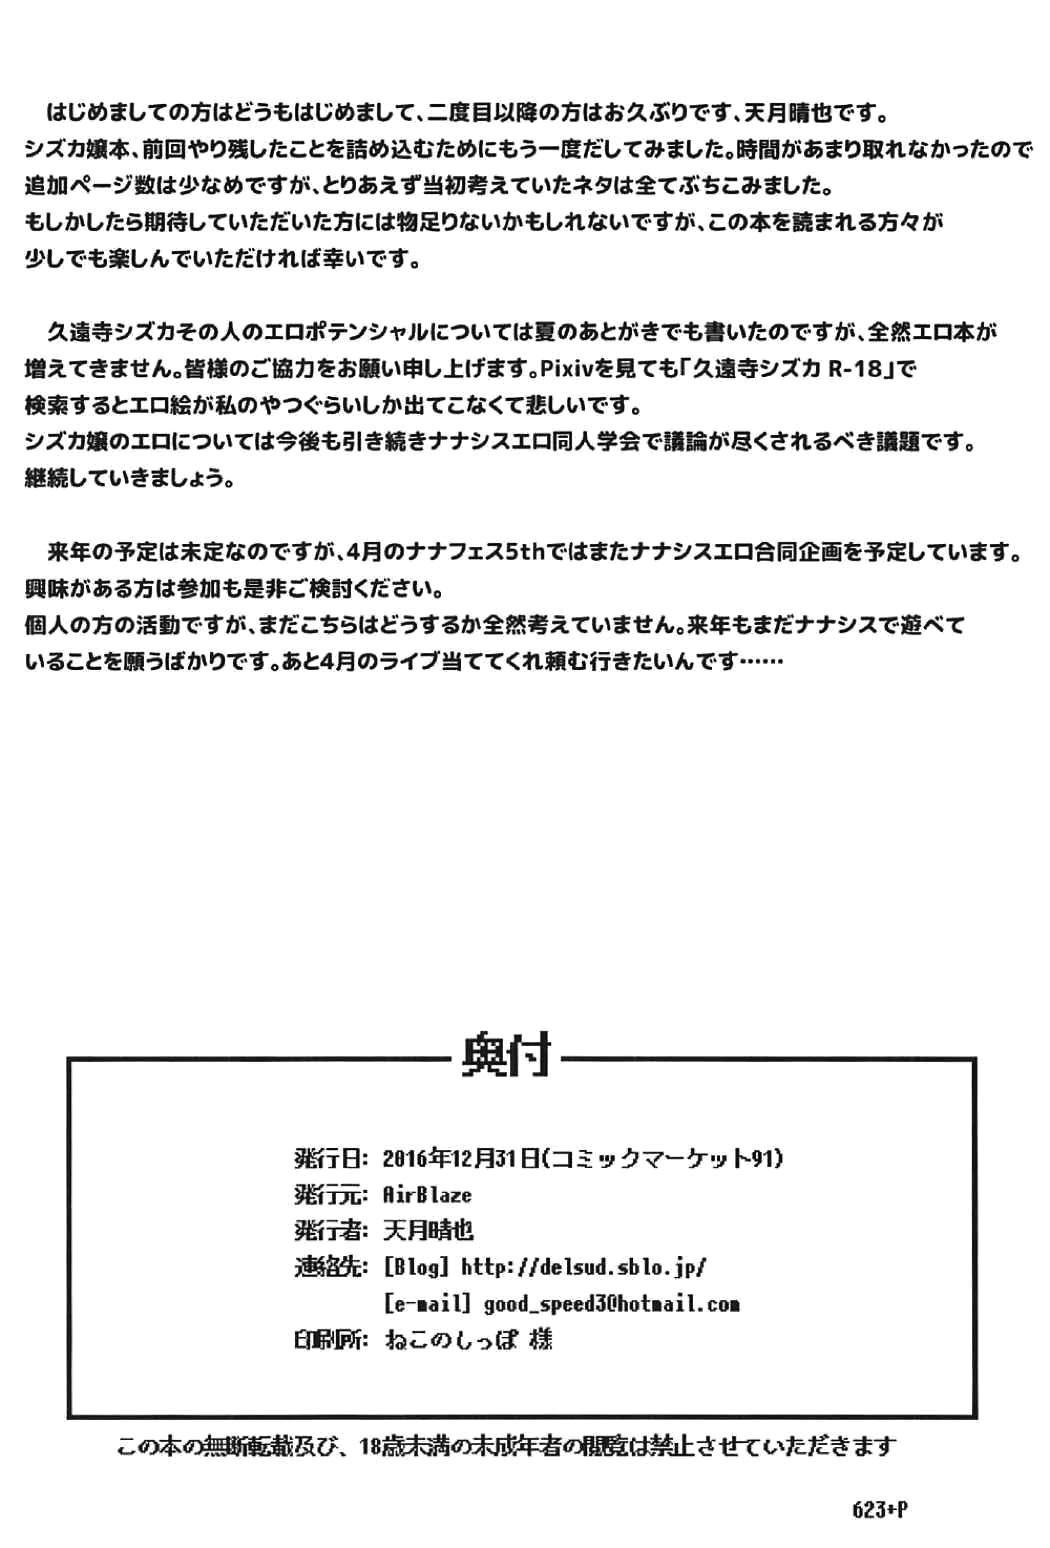 DC Ban Kuonji Shizuka to Iku Dokidoki Fan Bus Tour 44